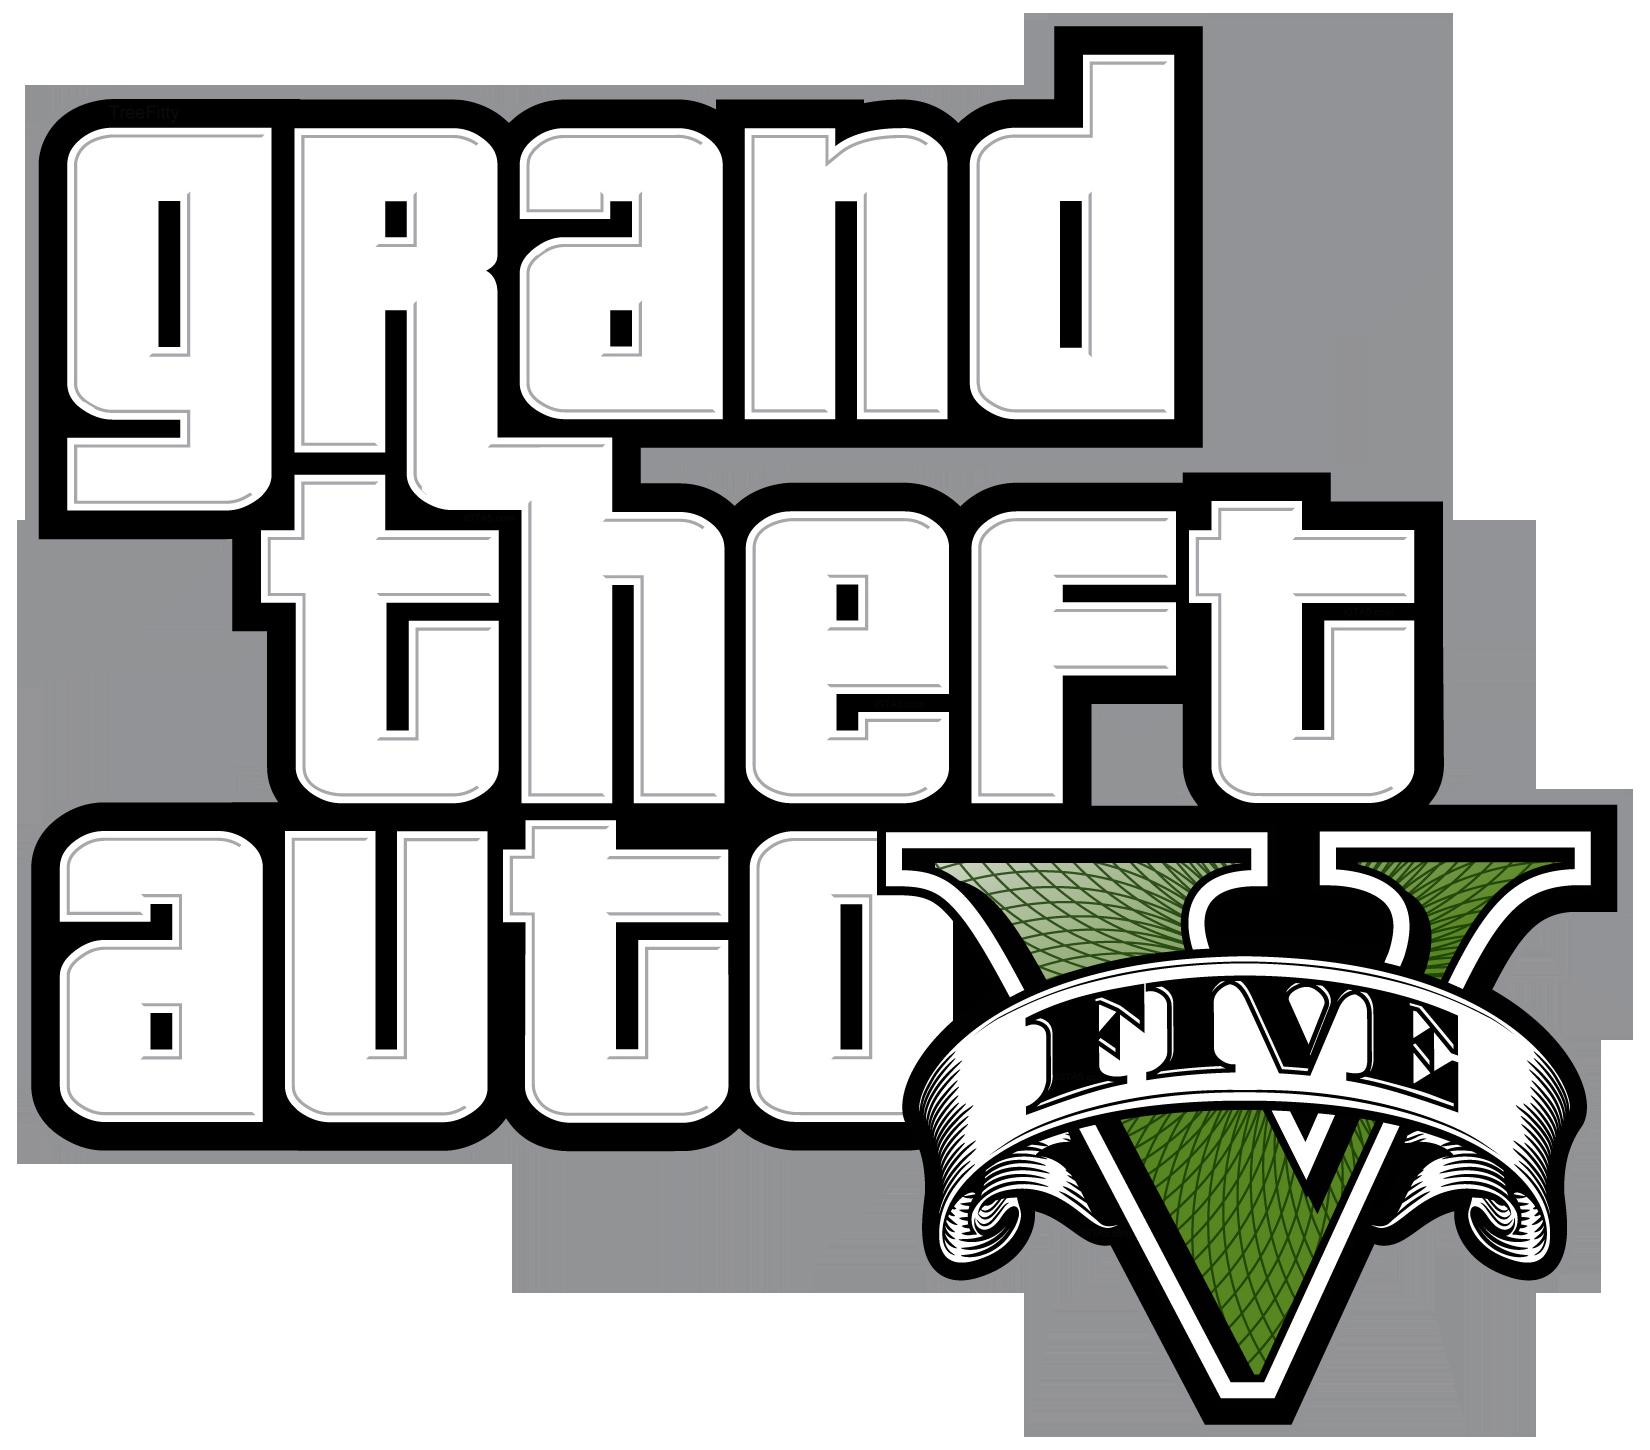 Gta V Logo Fmp